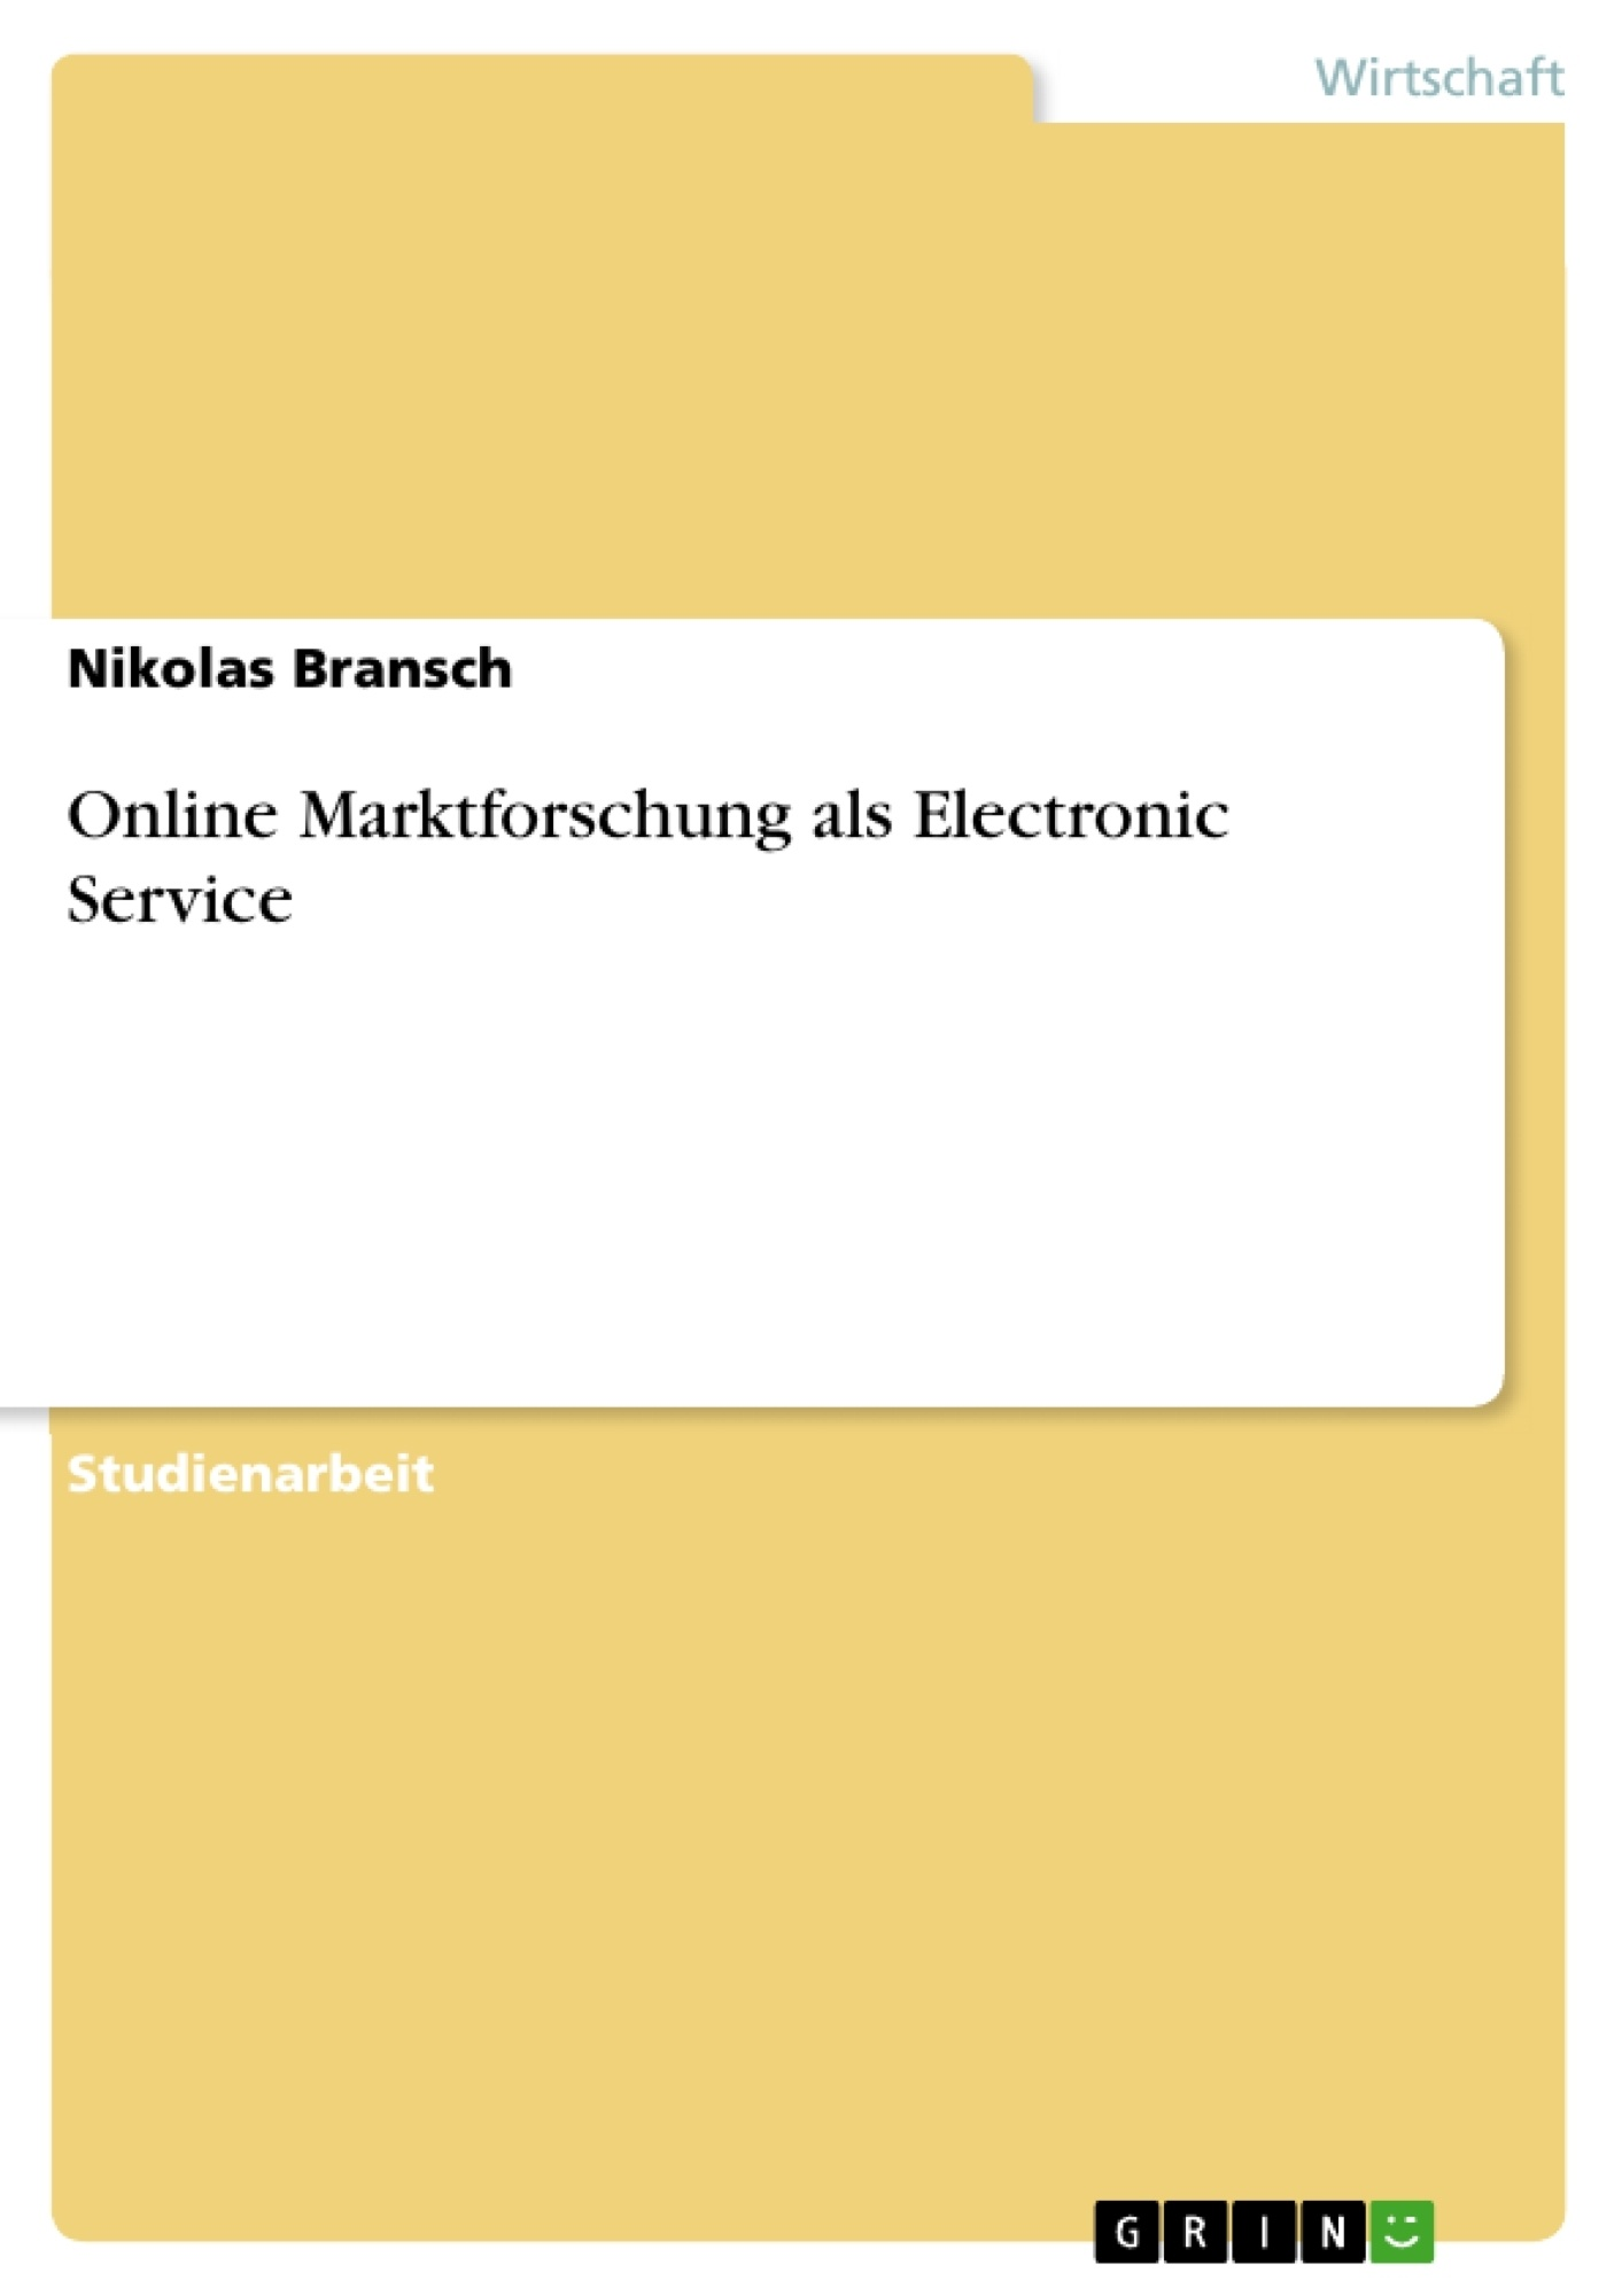 Titel: Online Marktforschung als Electronic Service